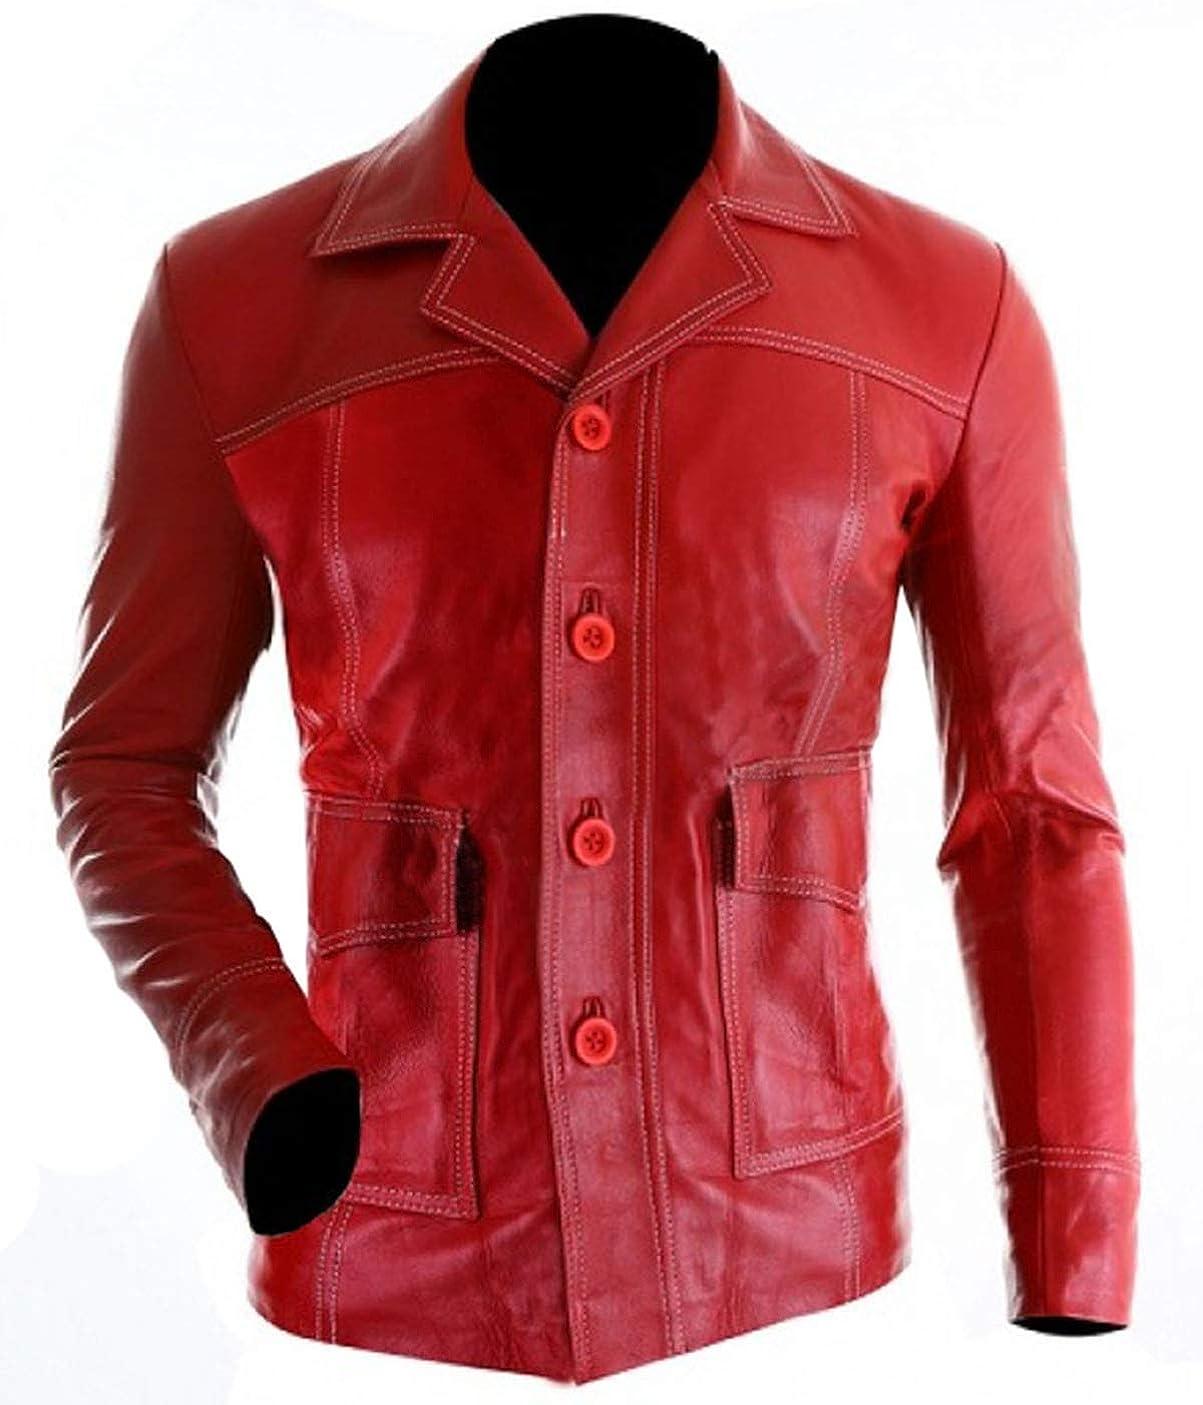 UGFashions Fight Coat Tyler Durden Mayhem Pitt Retro Red Leather Club Jacket